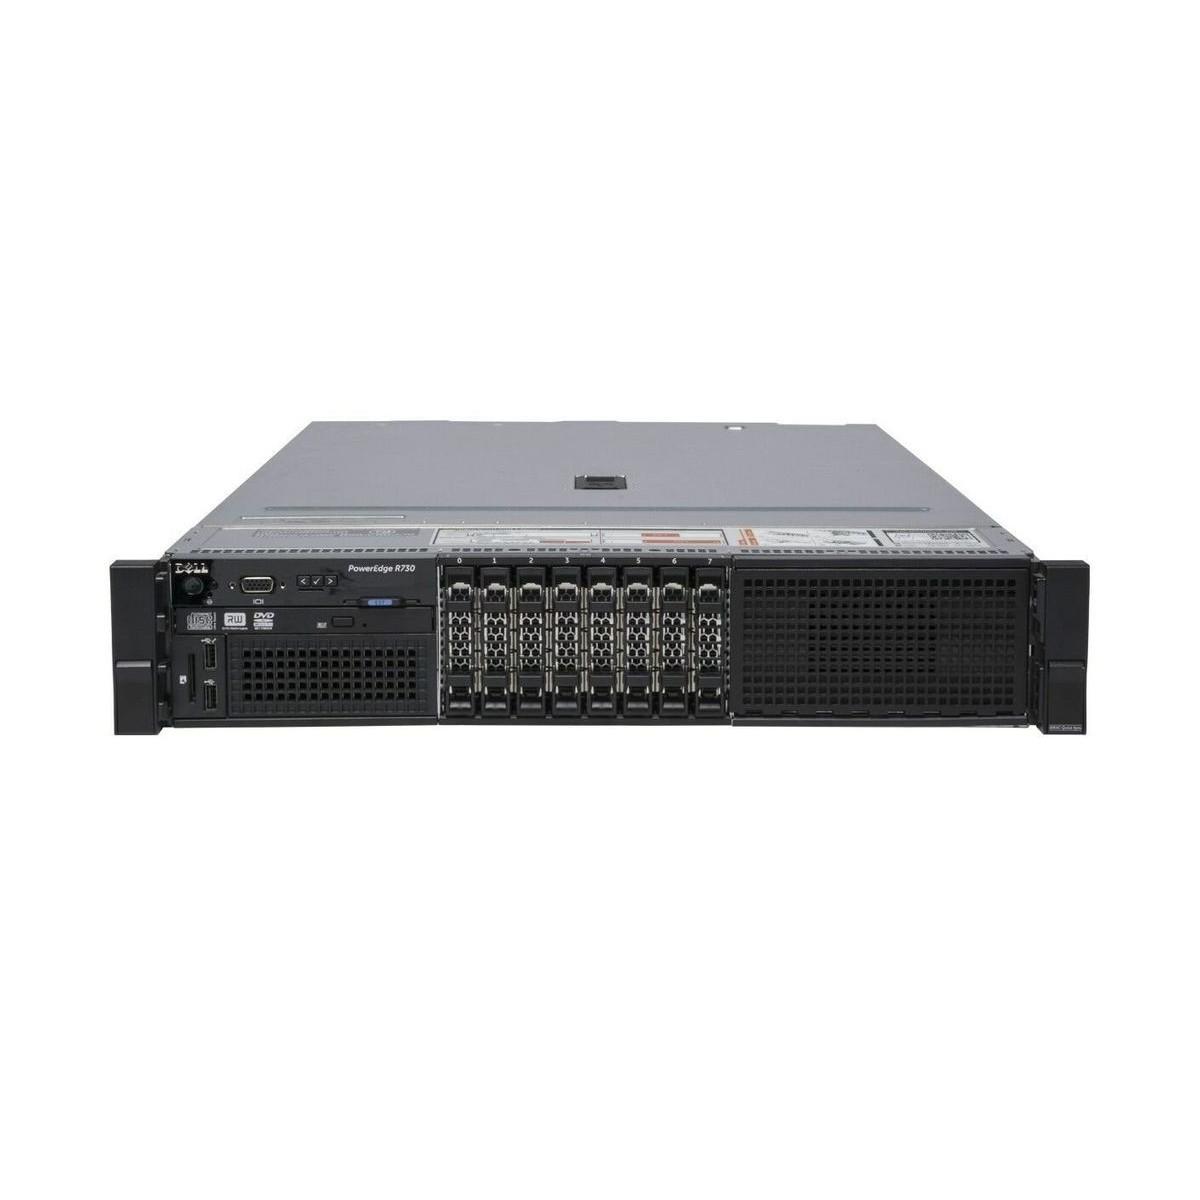 INTERNAL FAX MODEM TELES ISDN S0/PCI CONTROLLER